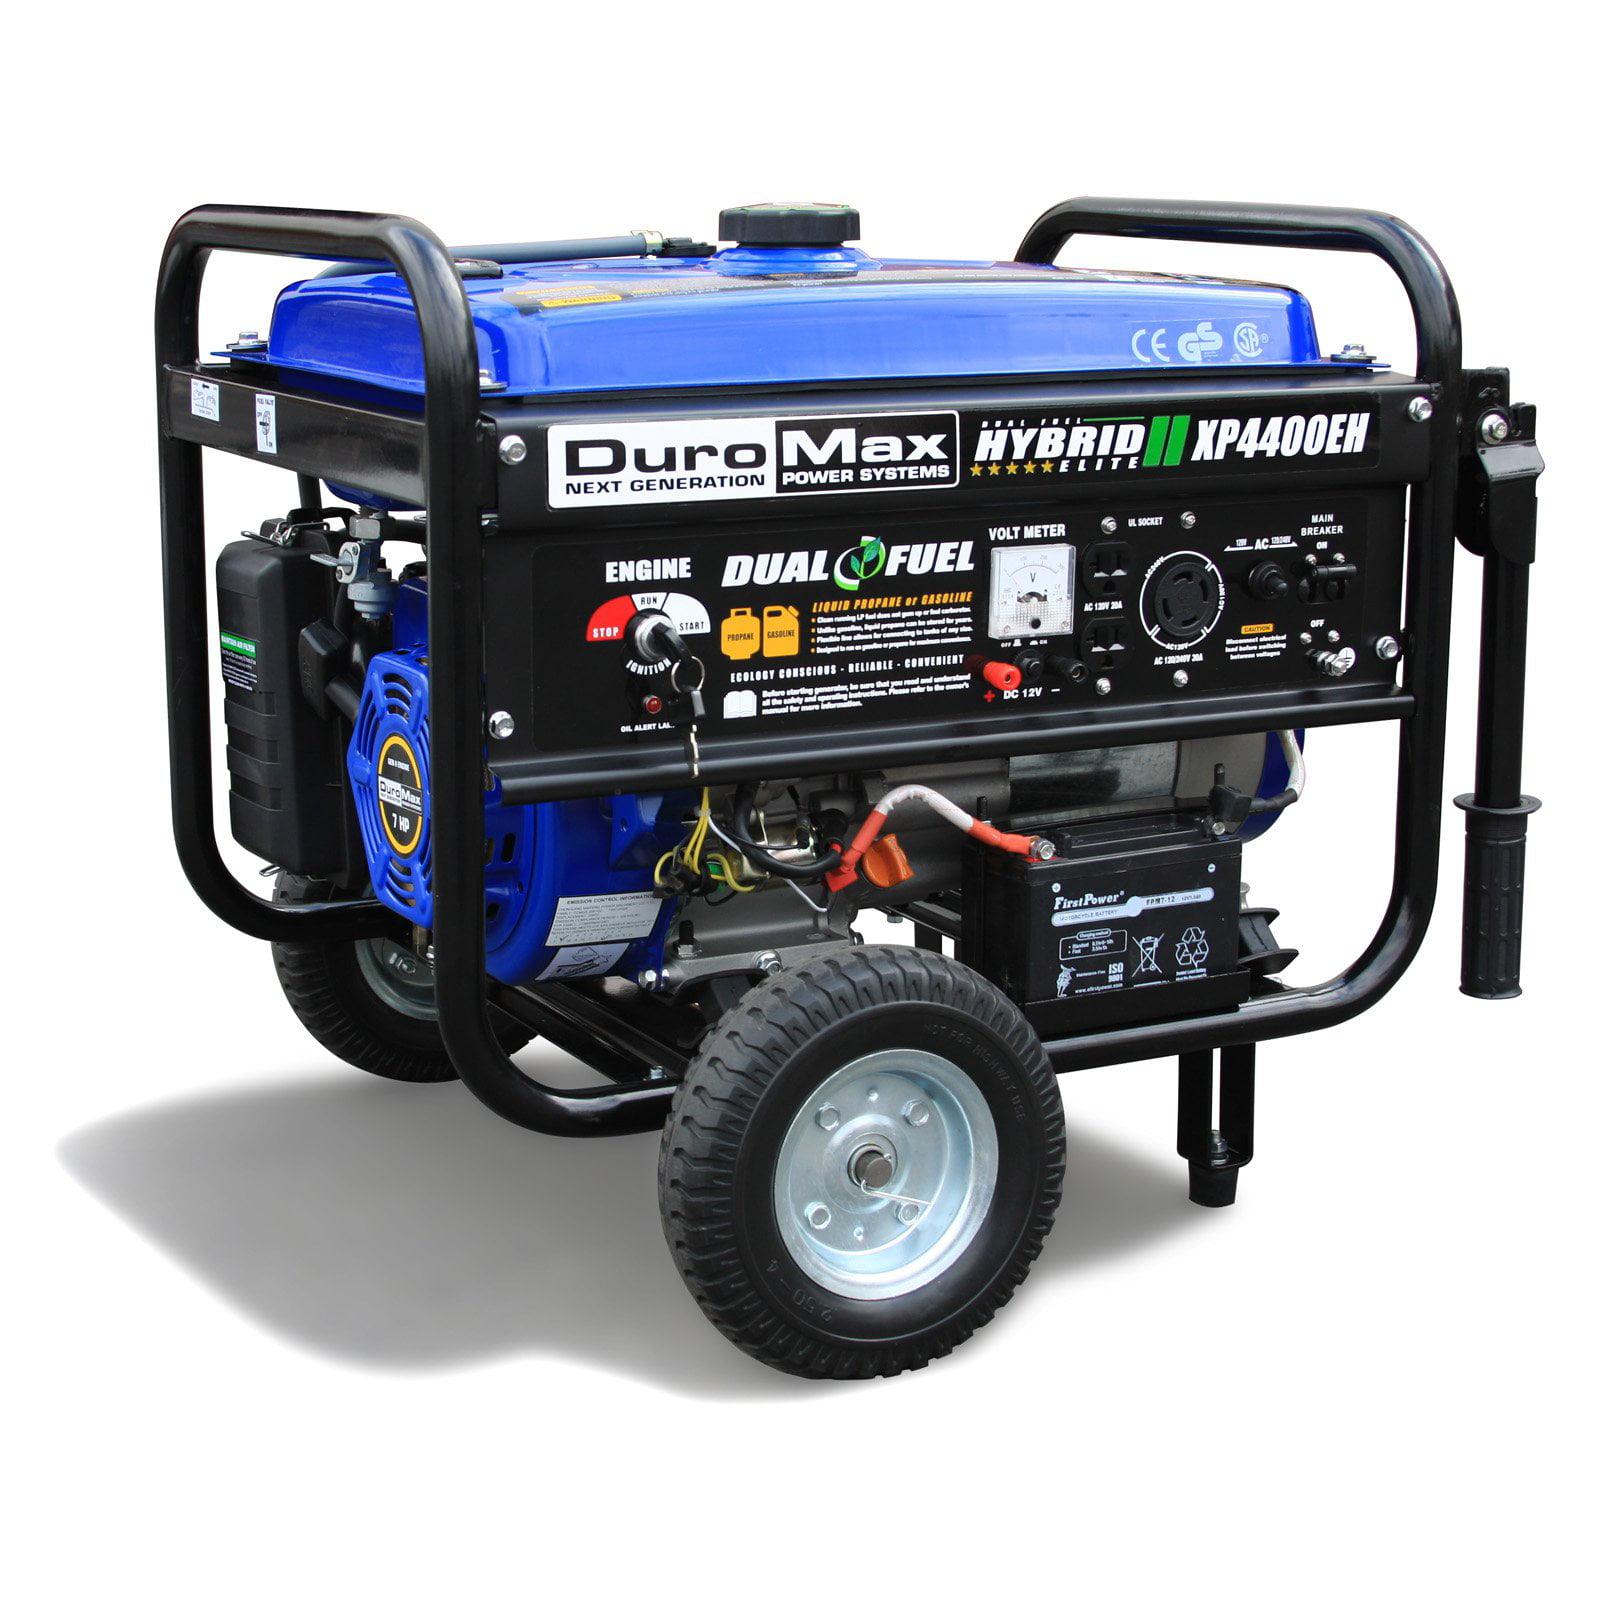 DuroMax Dual Fuel 4,400W Hybrid Propane/Gasoline Generator